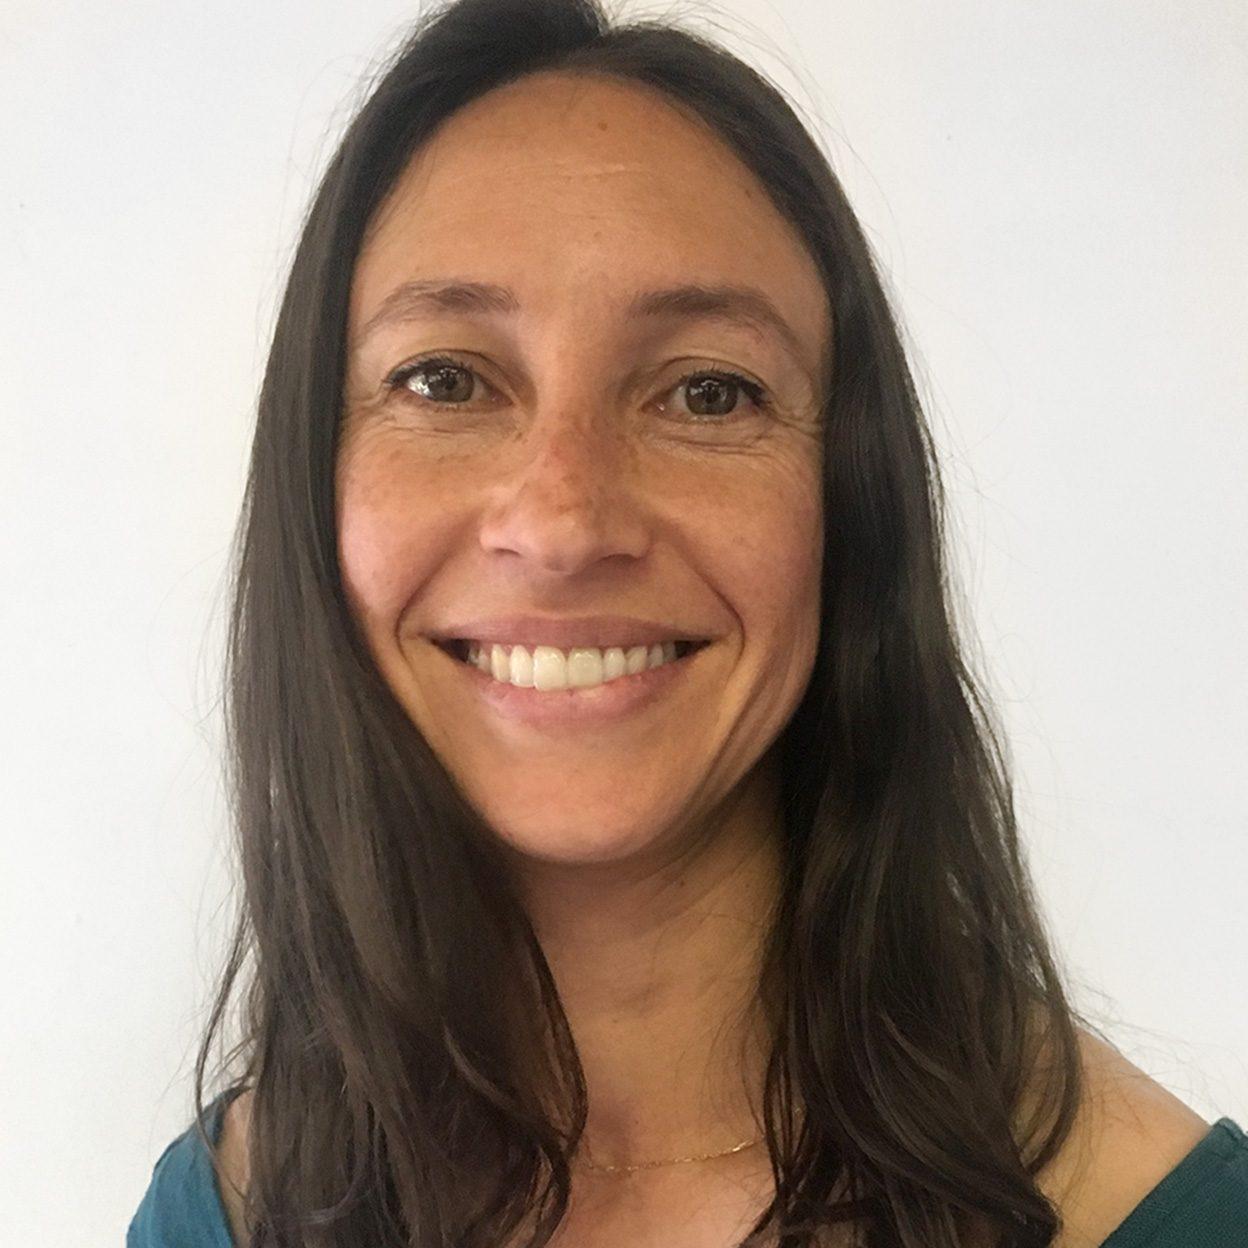 Letitia Fernandez Ivins